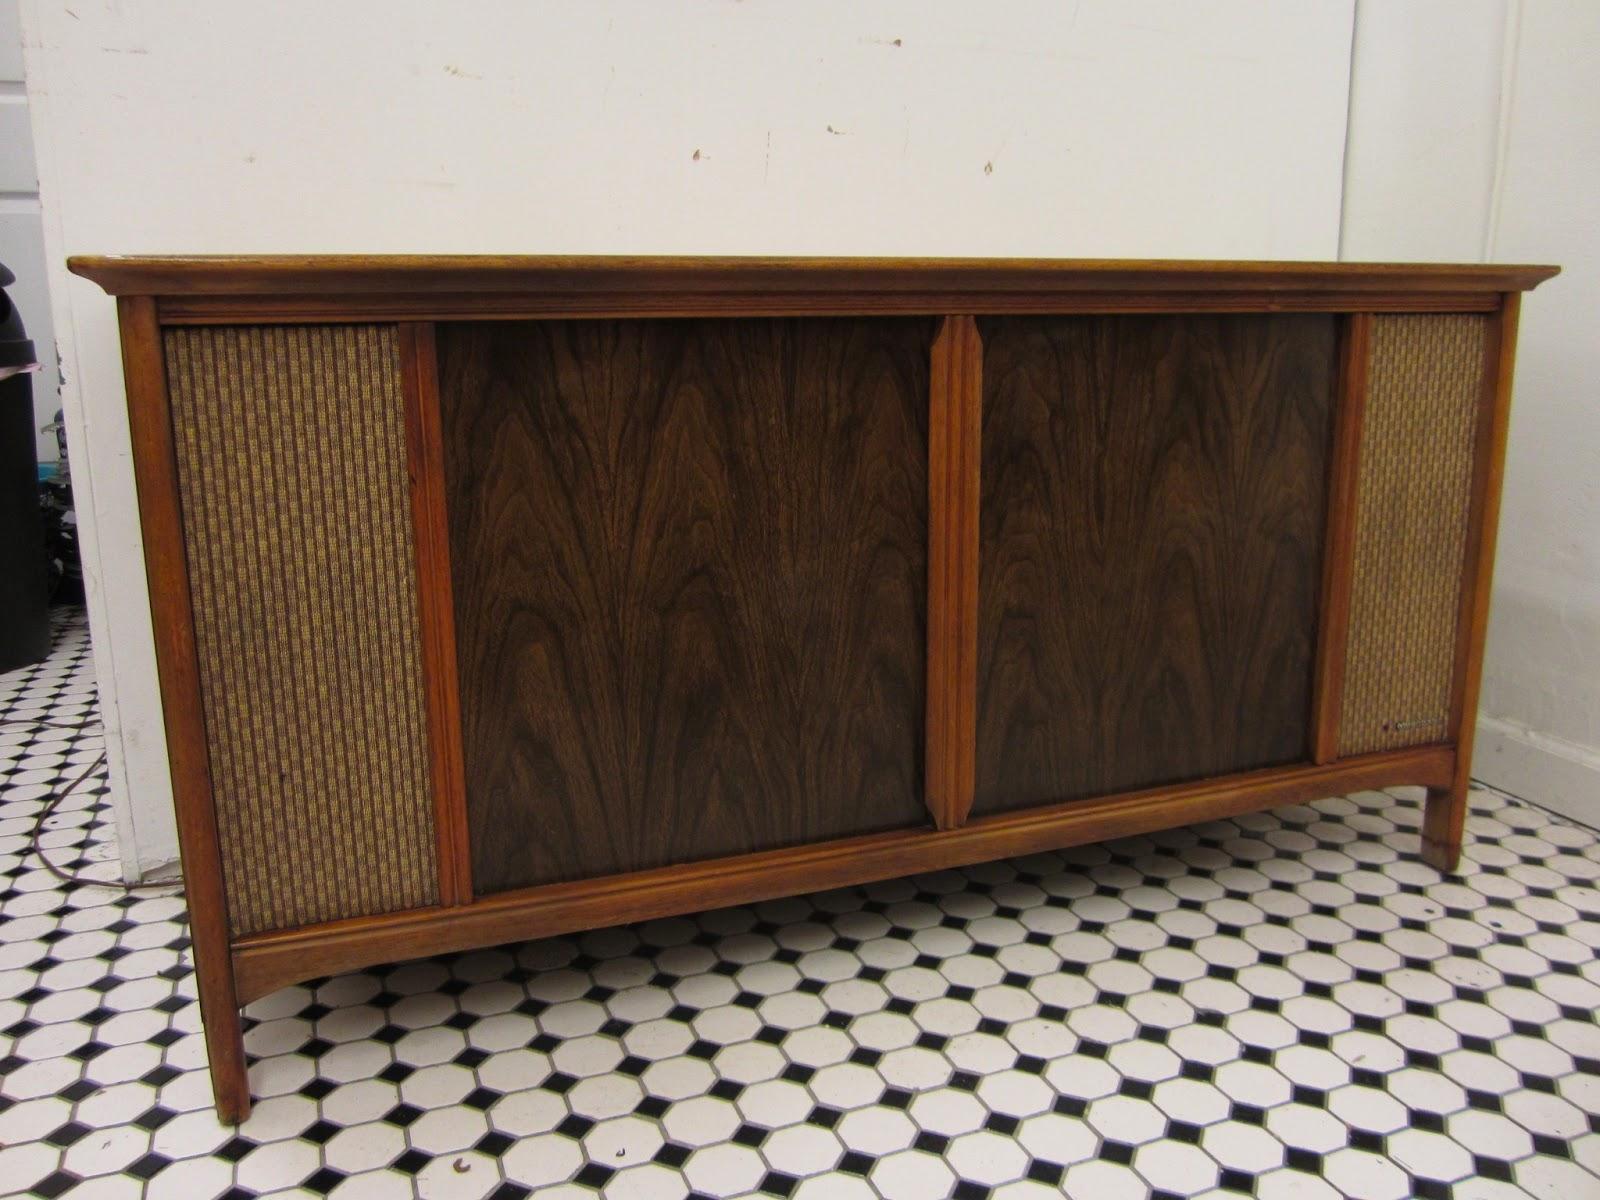 uk small mid media of hypermallapartments elegant fresh elm bar west century cabinet